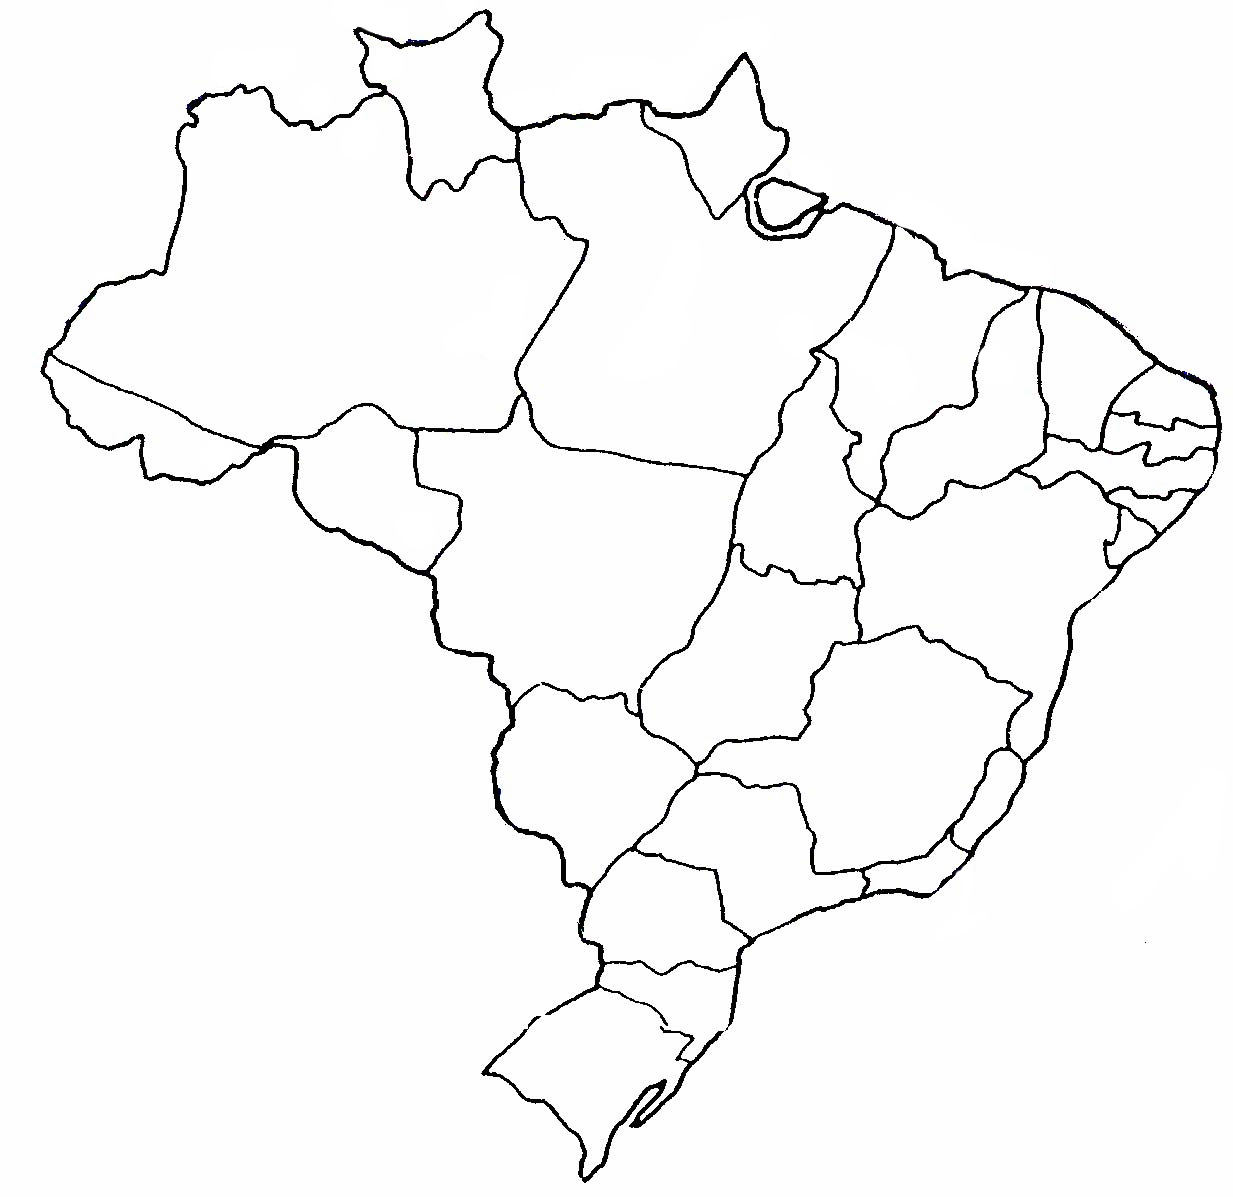 Mapa do Brasil para colorir e imprimir